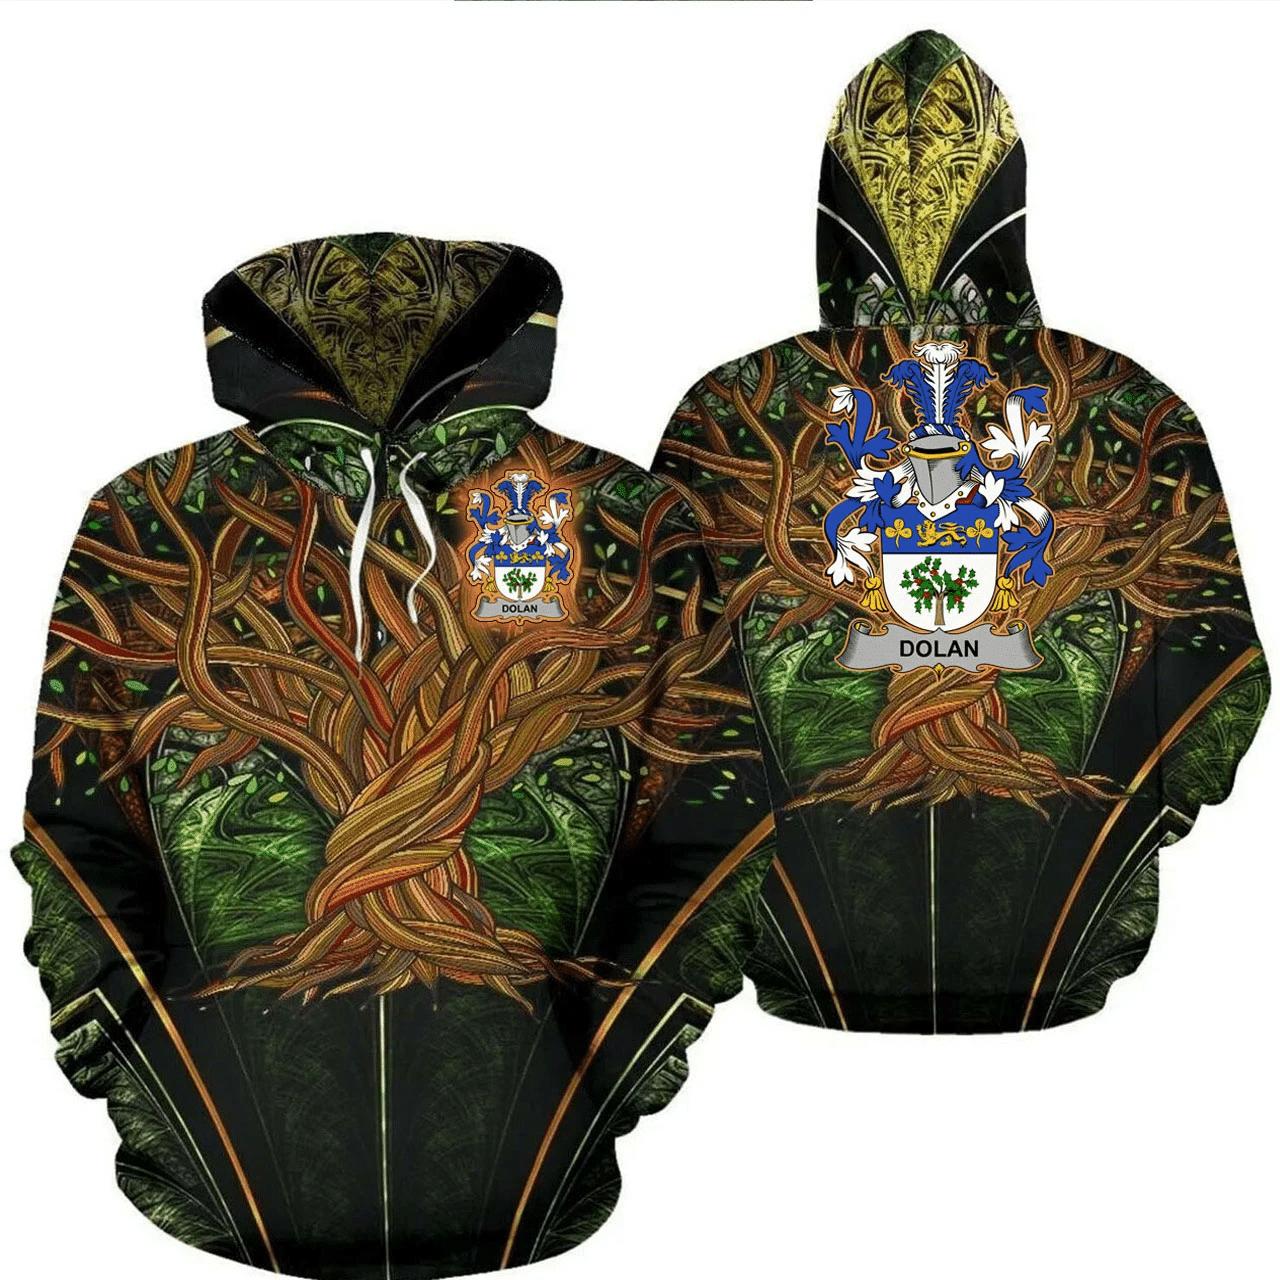 1stIreland Ireland Hoodie - Dolan or O'Dolan Irish Family Crest Hoodie - Tree Of Life A7